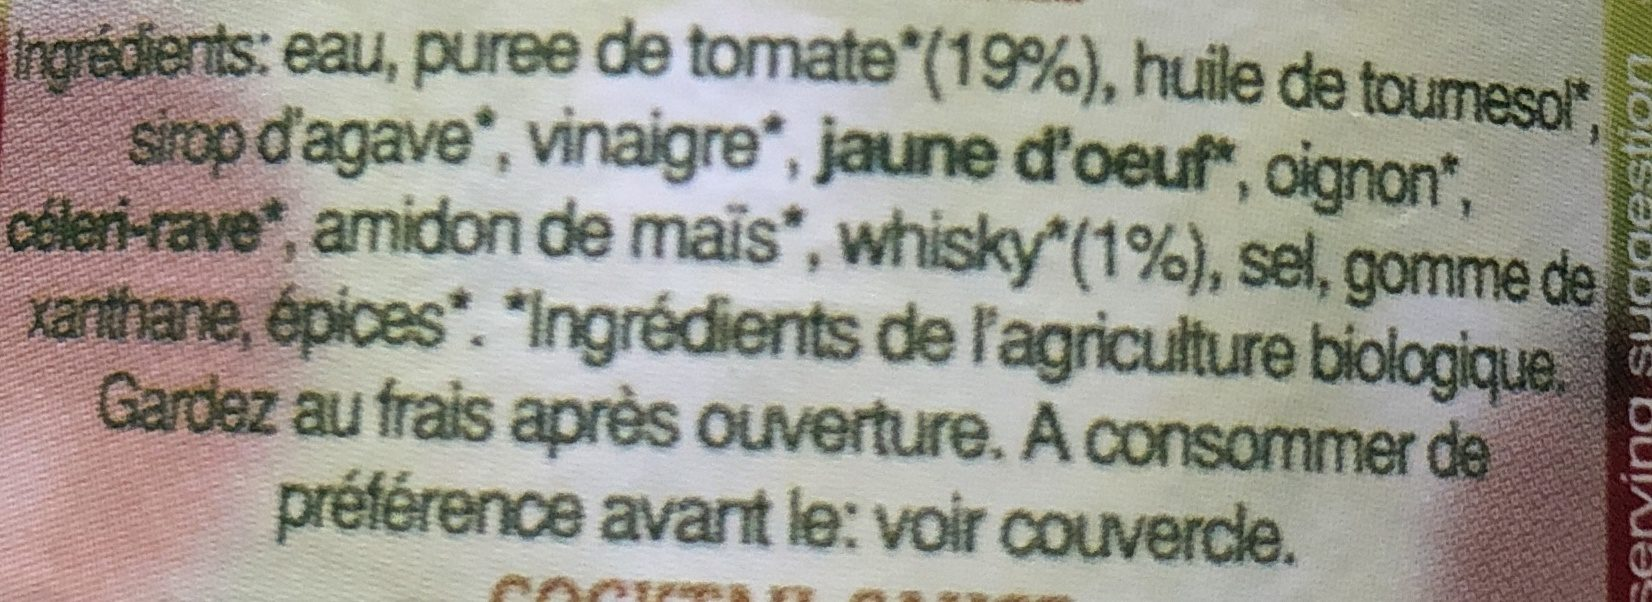 Cocktail Sauce - Ingredients - fr